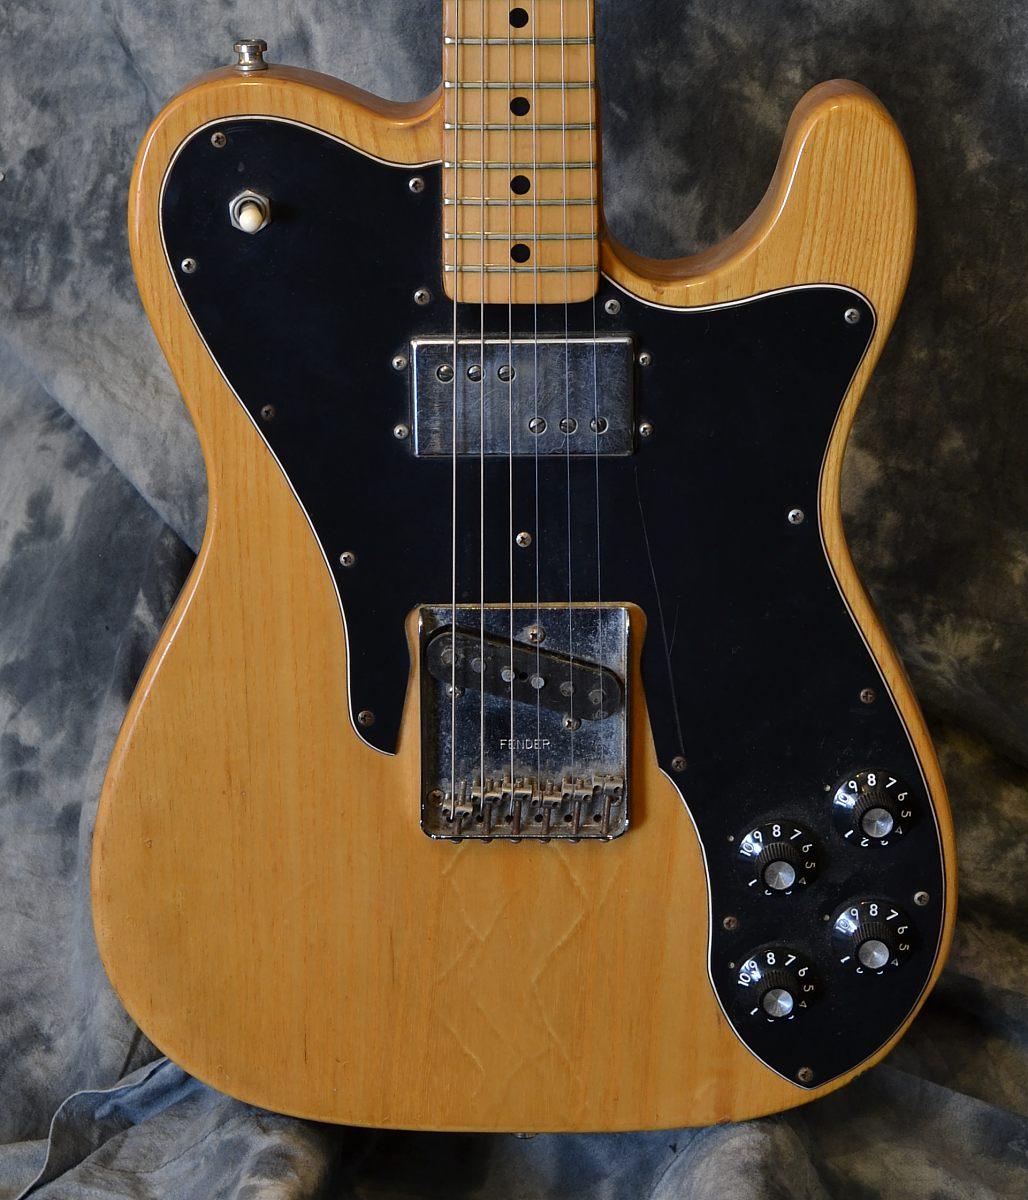 Fender_Tele Custom_1974(C)_top